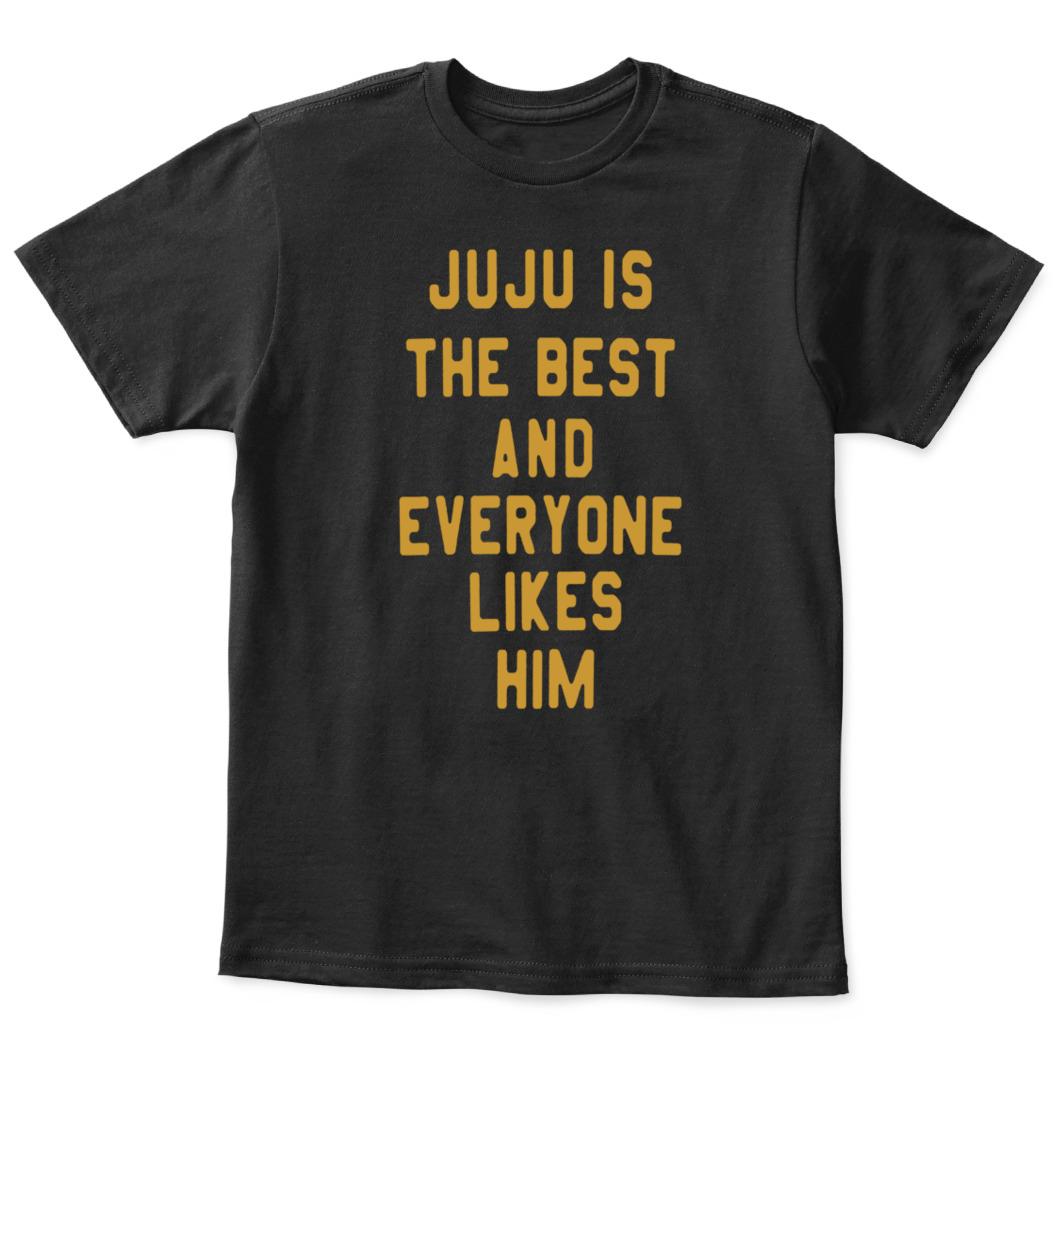 Tank Top Good P/_i/_t/_t/_s/_b/_u/_r/_g/_h S/_t/_e/_e/_l/_e/_r/_s Juju Smith Schuster 19 Unisex T-Shirt Long Sleeve Short Sleeves Hoodie for Men Women Kids